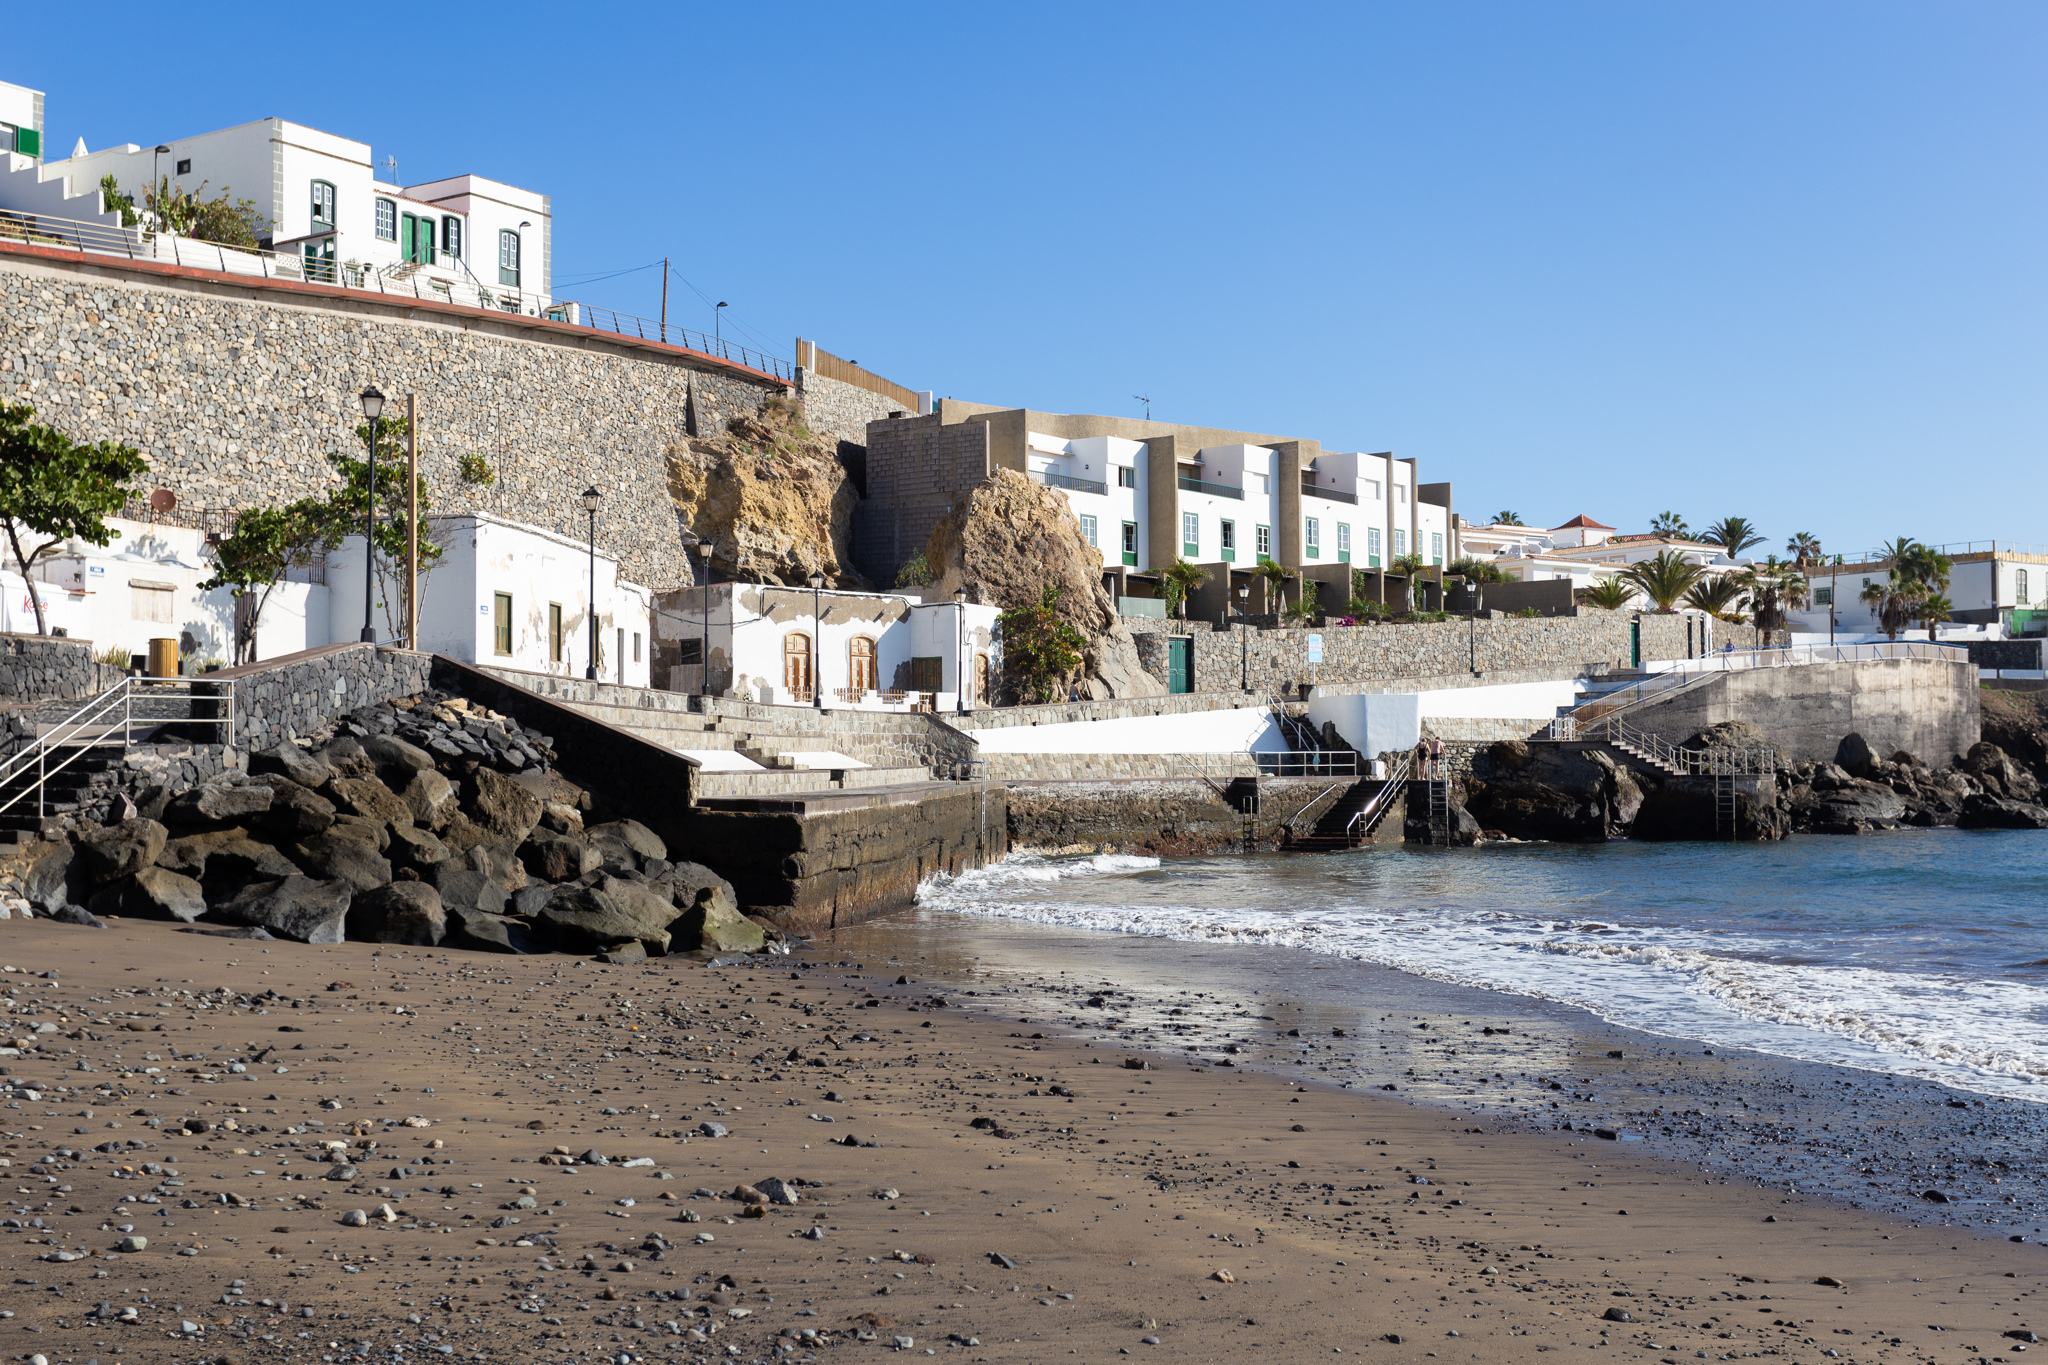 Holiday house direkt am Meer mit eigenem Pool (1671160), Poris de Abona, Tenerife, Canary Islands, Spain, picture 46